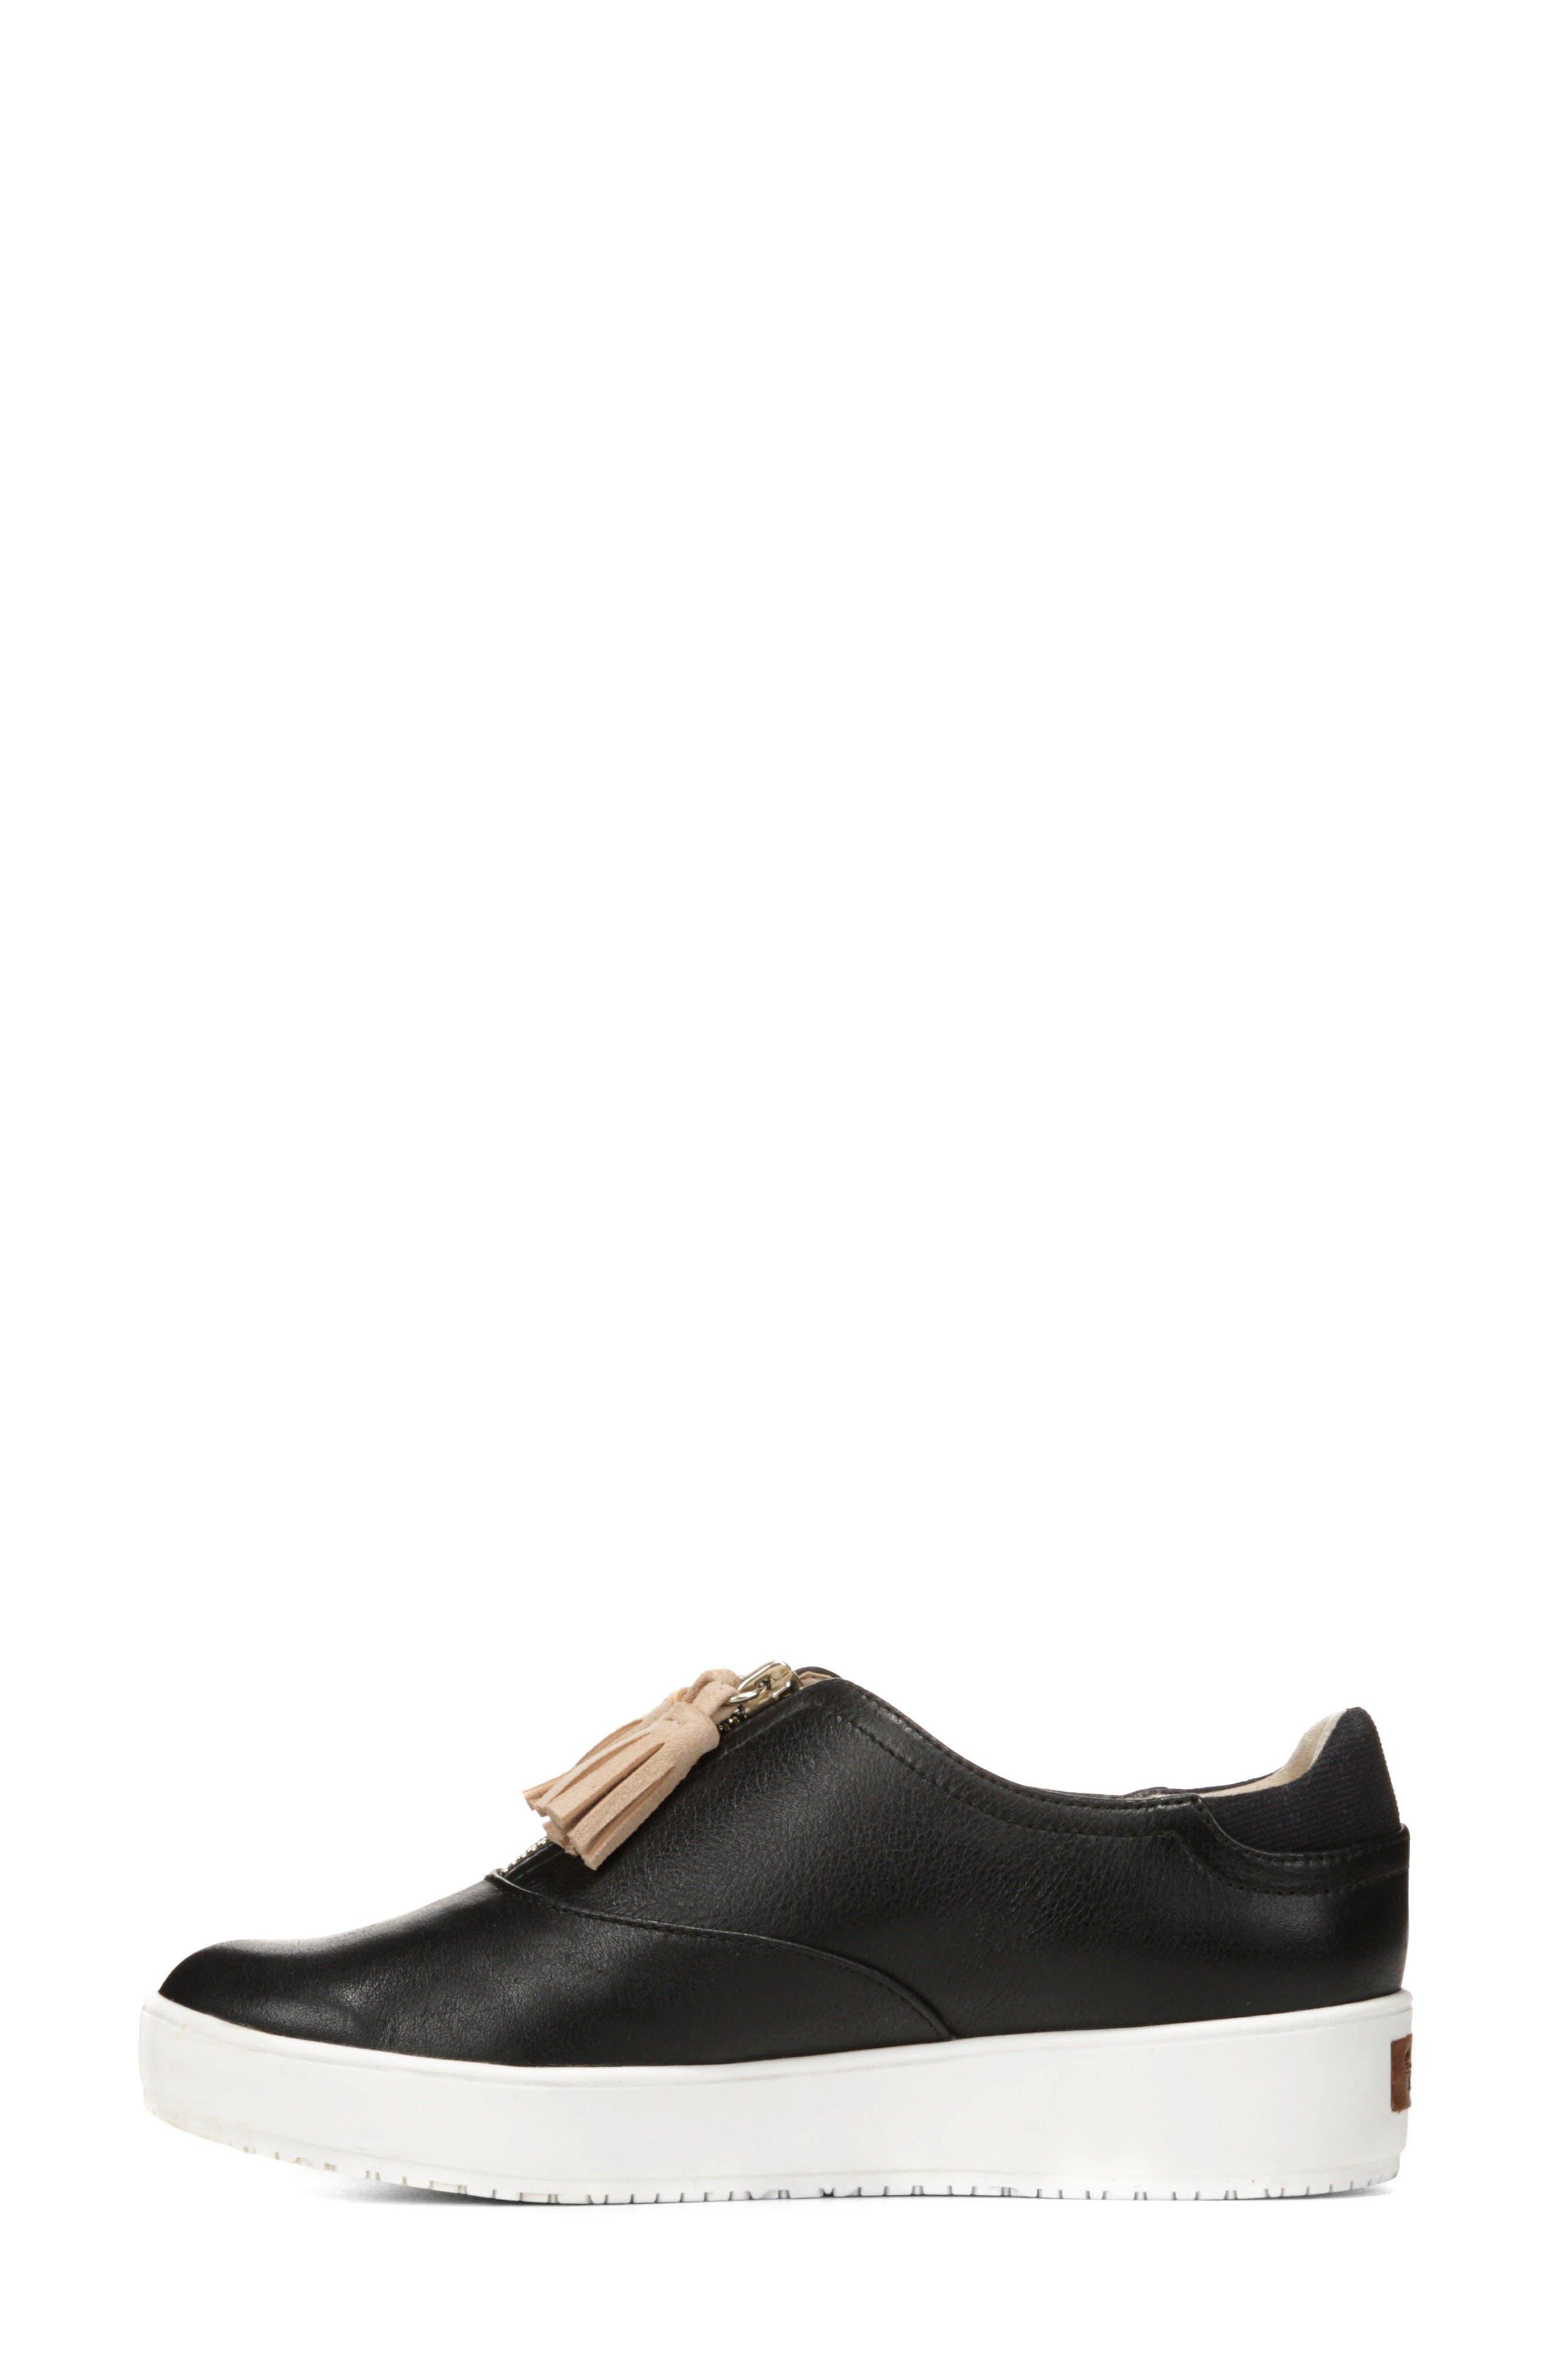 Blakely Tassel Zip Sneaker,                             Alternate thumbnail 9, color,                             001